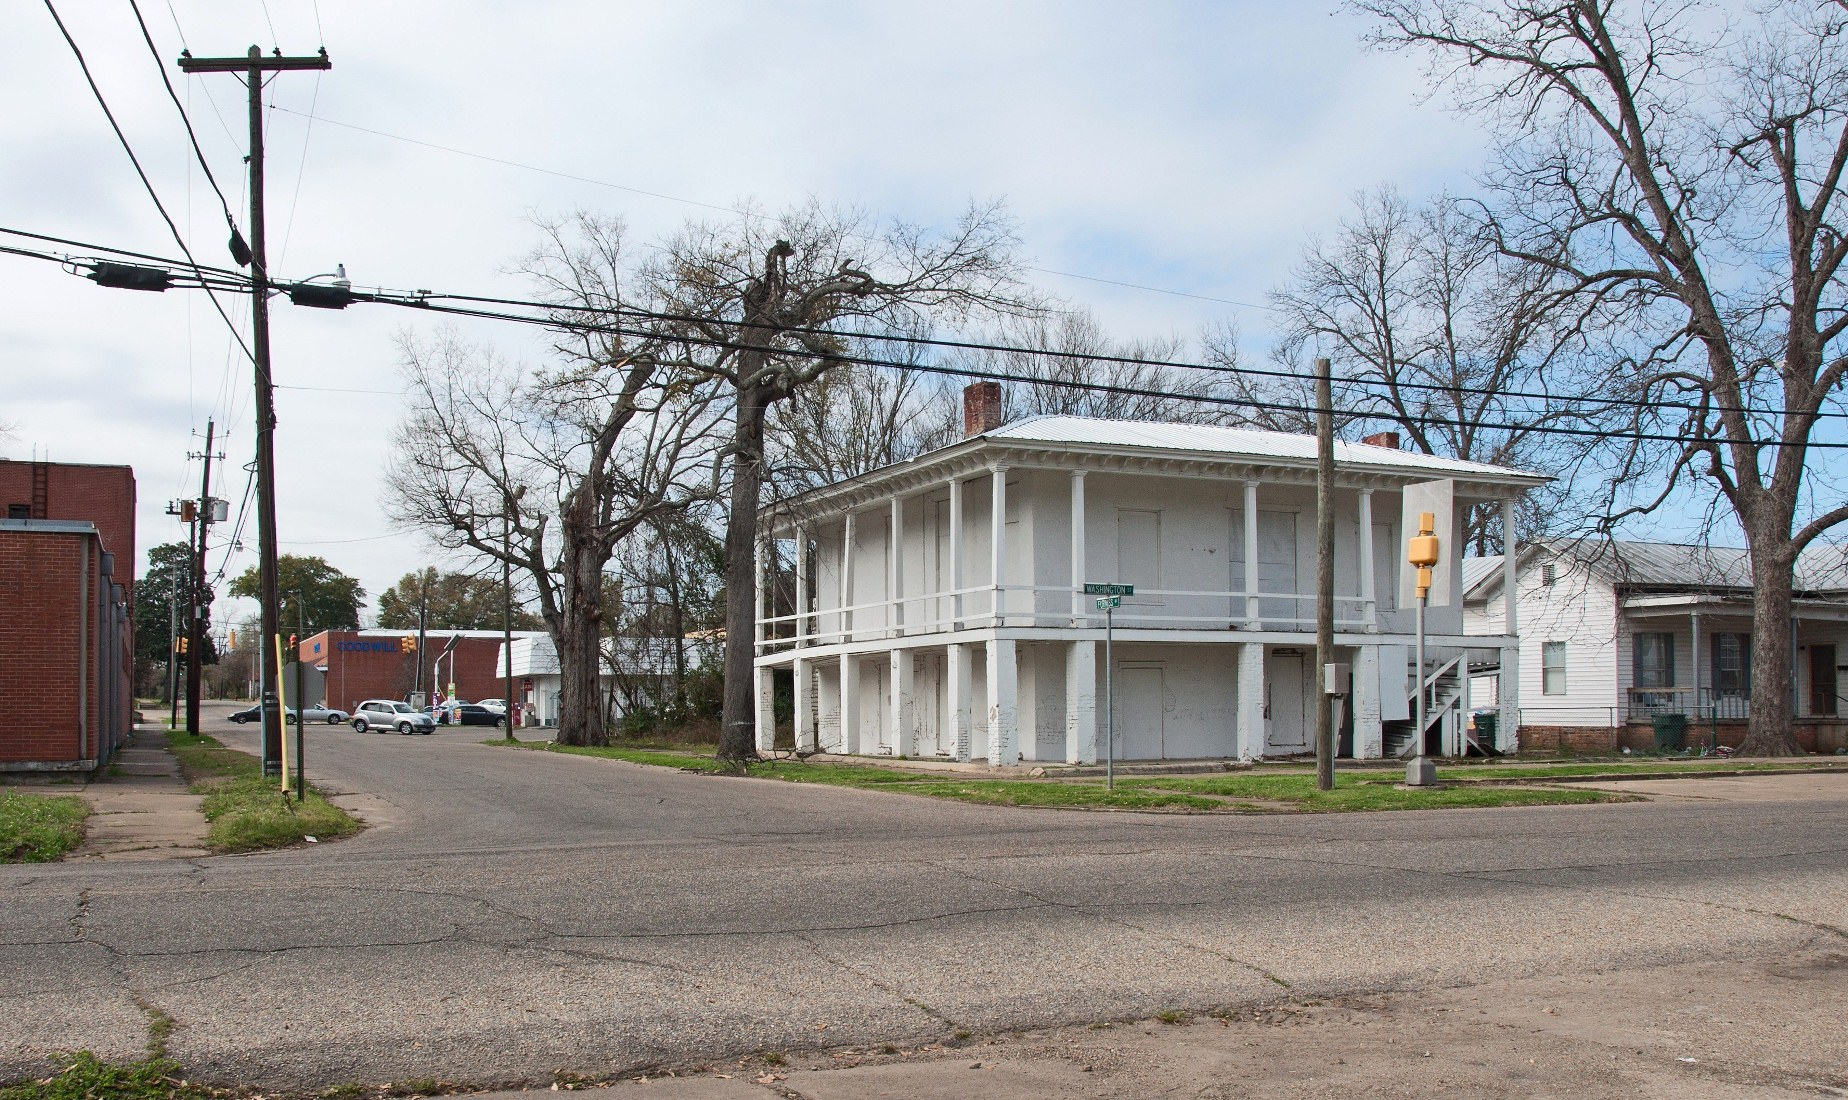 Selma 50 >> File:Wesley Plattenburg House at Selma, AL.jpg - Wikimedia Commons